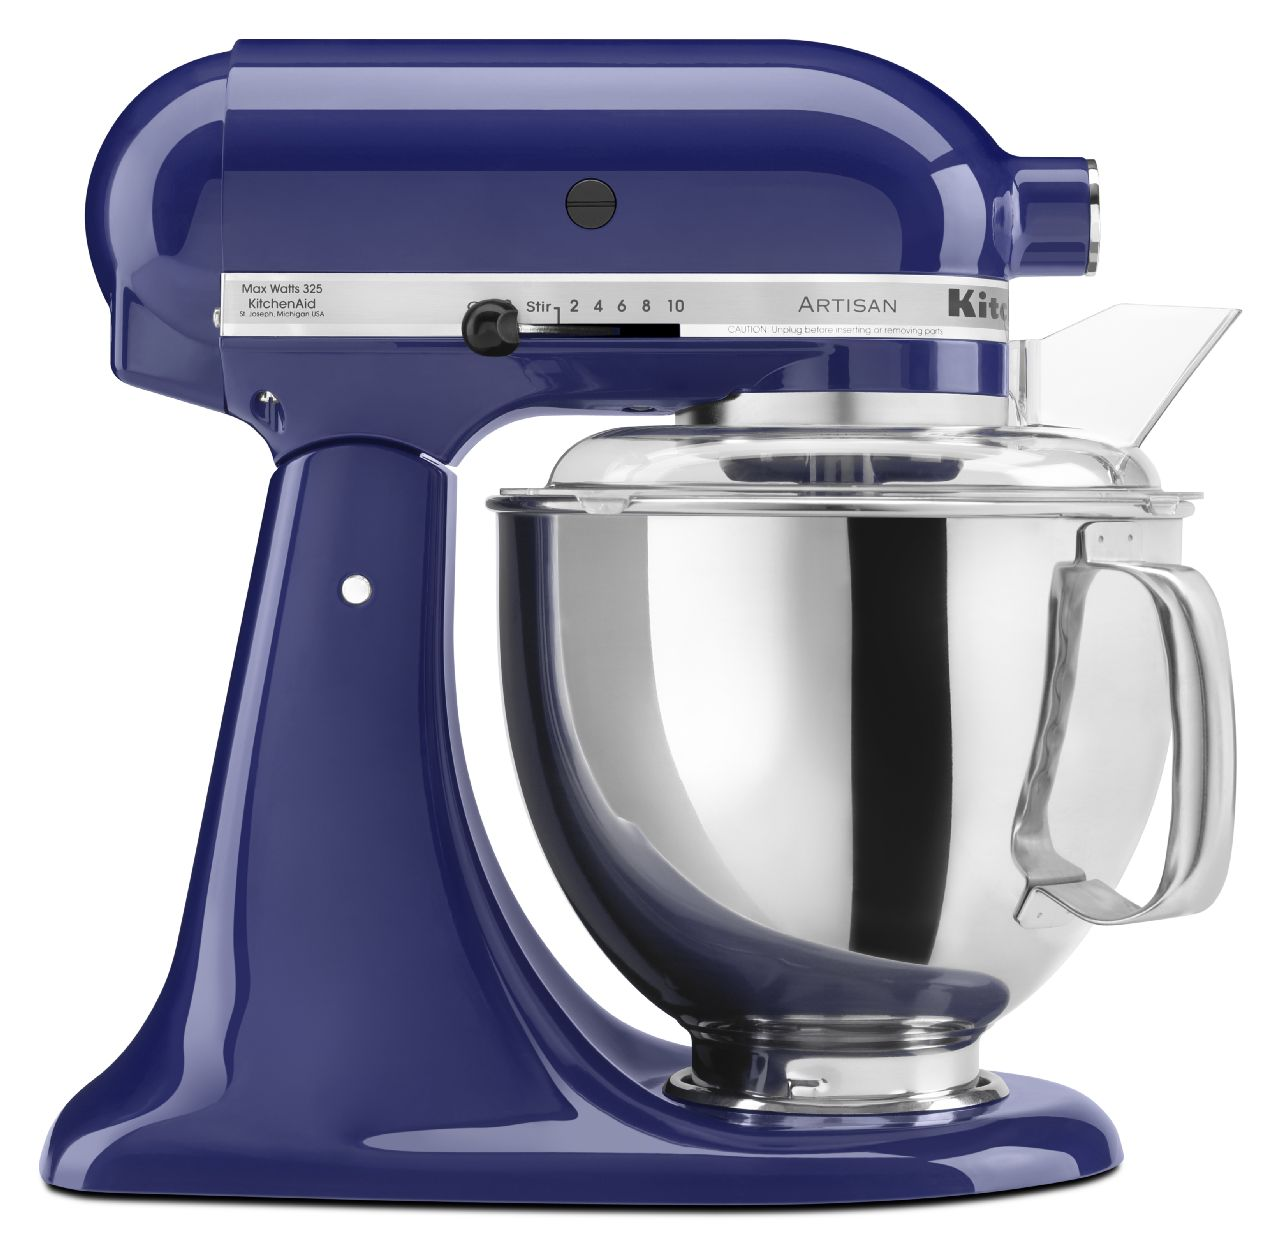 KitchenAid Artisan® Series 5 Quart. Stand Mixer - Cobalt Blue